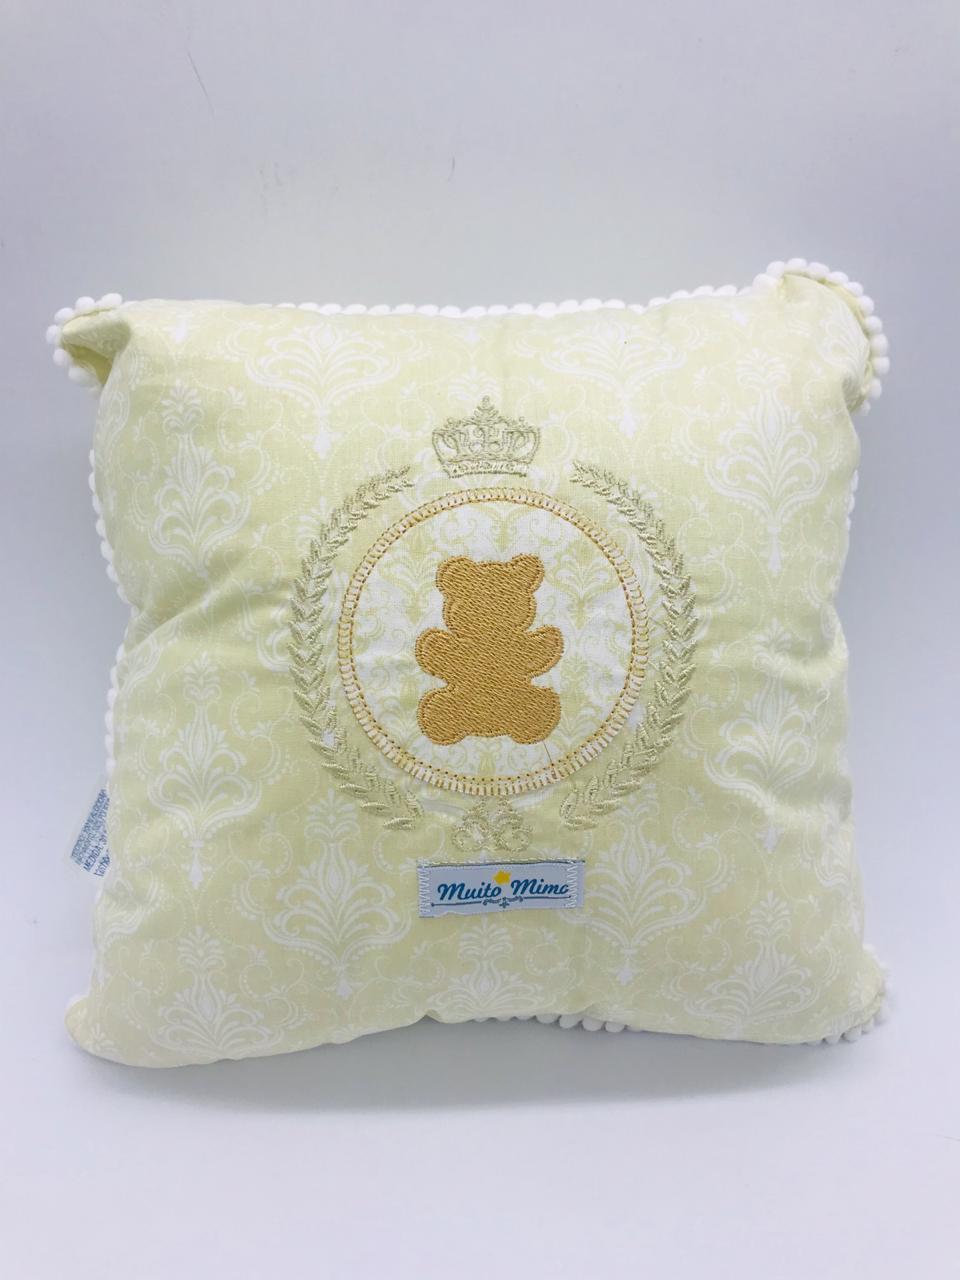 Travesseiro 30x30 Ursinho Bege - m Mimo Minasrey Ref 5542